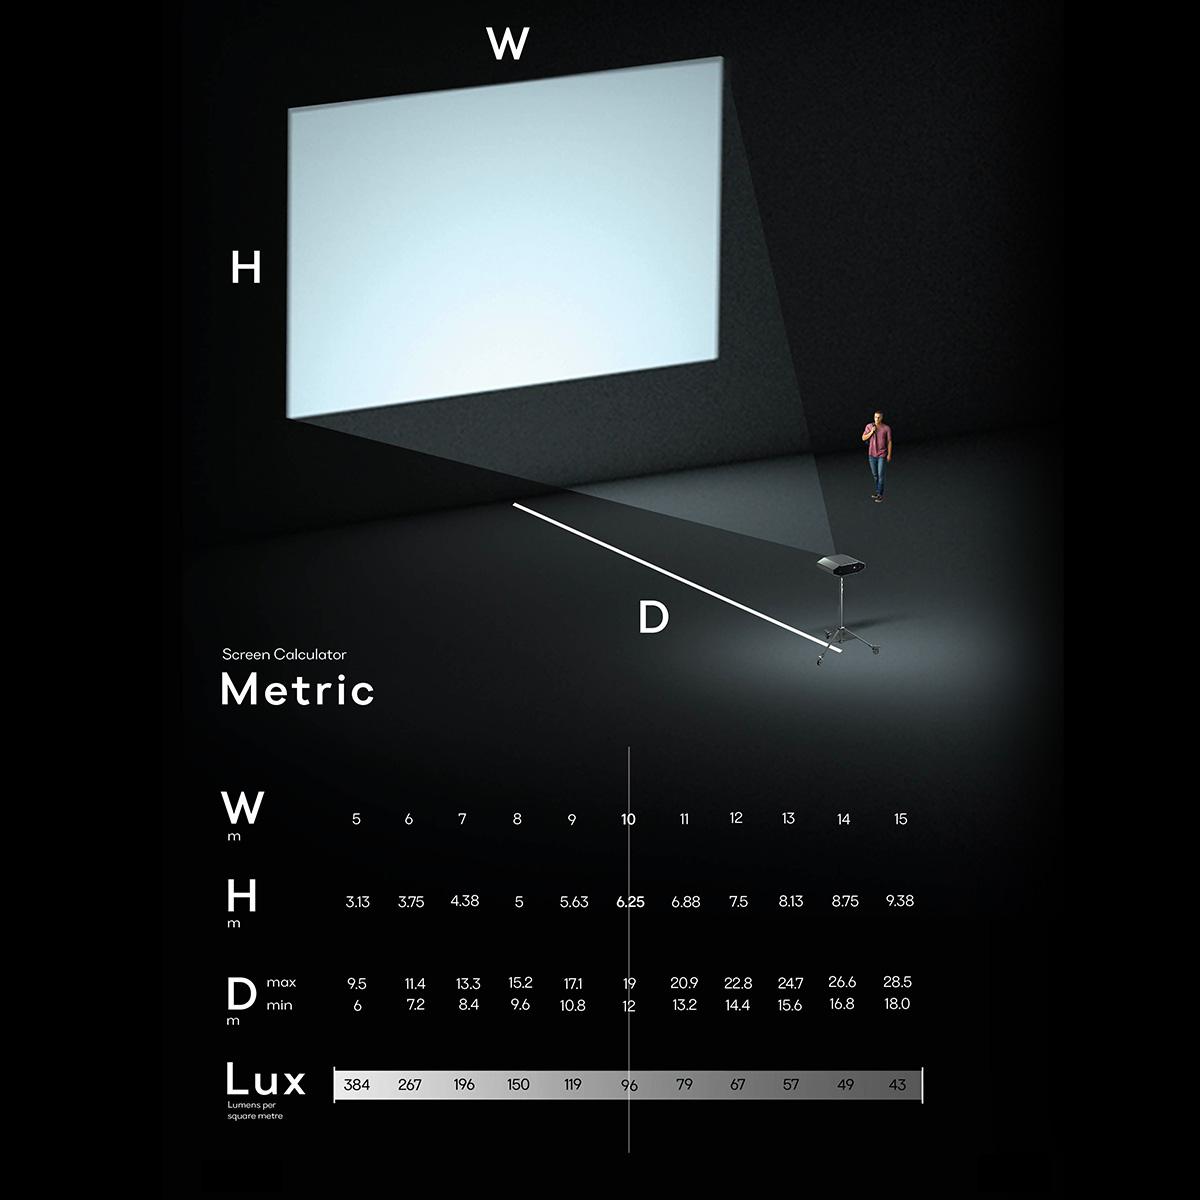 Throw Distance Screen Calculator - Metric Units